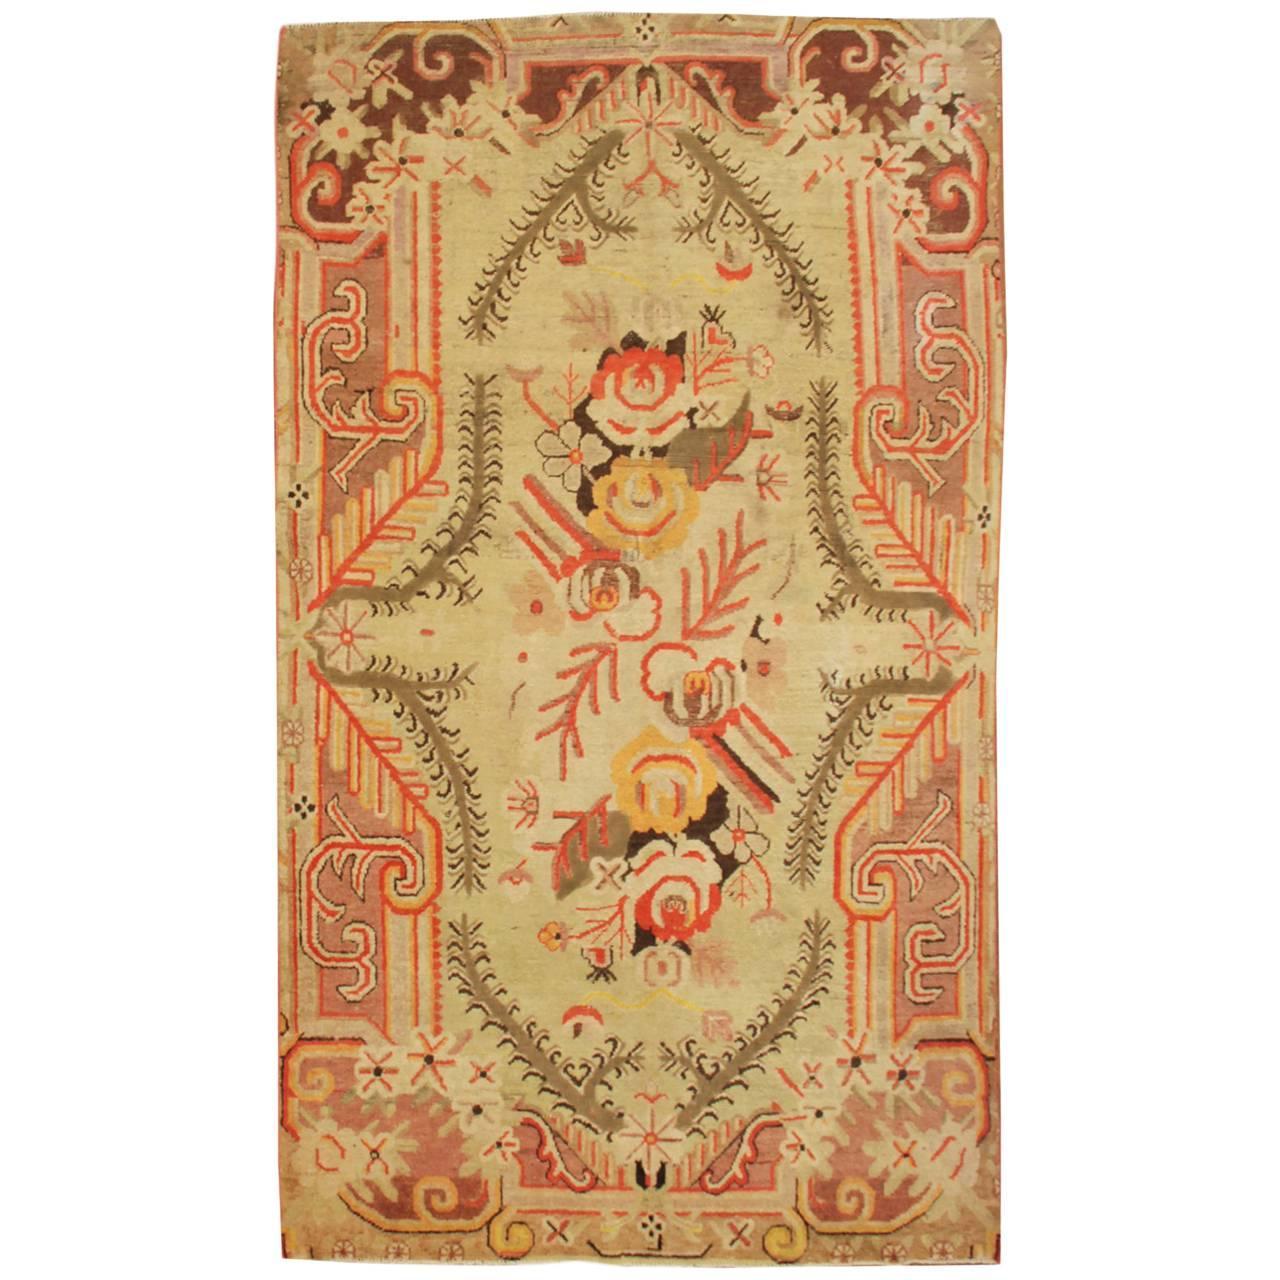 Antique Samarkand Rug